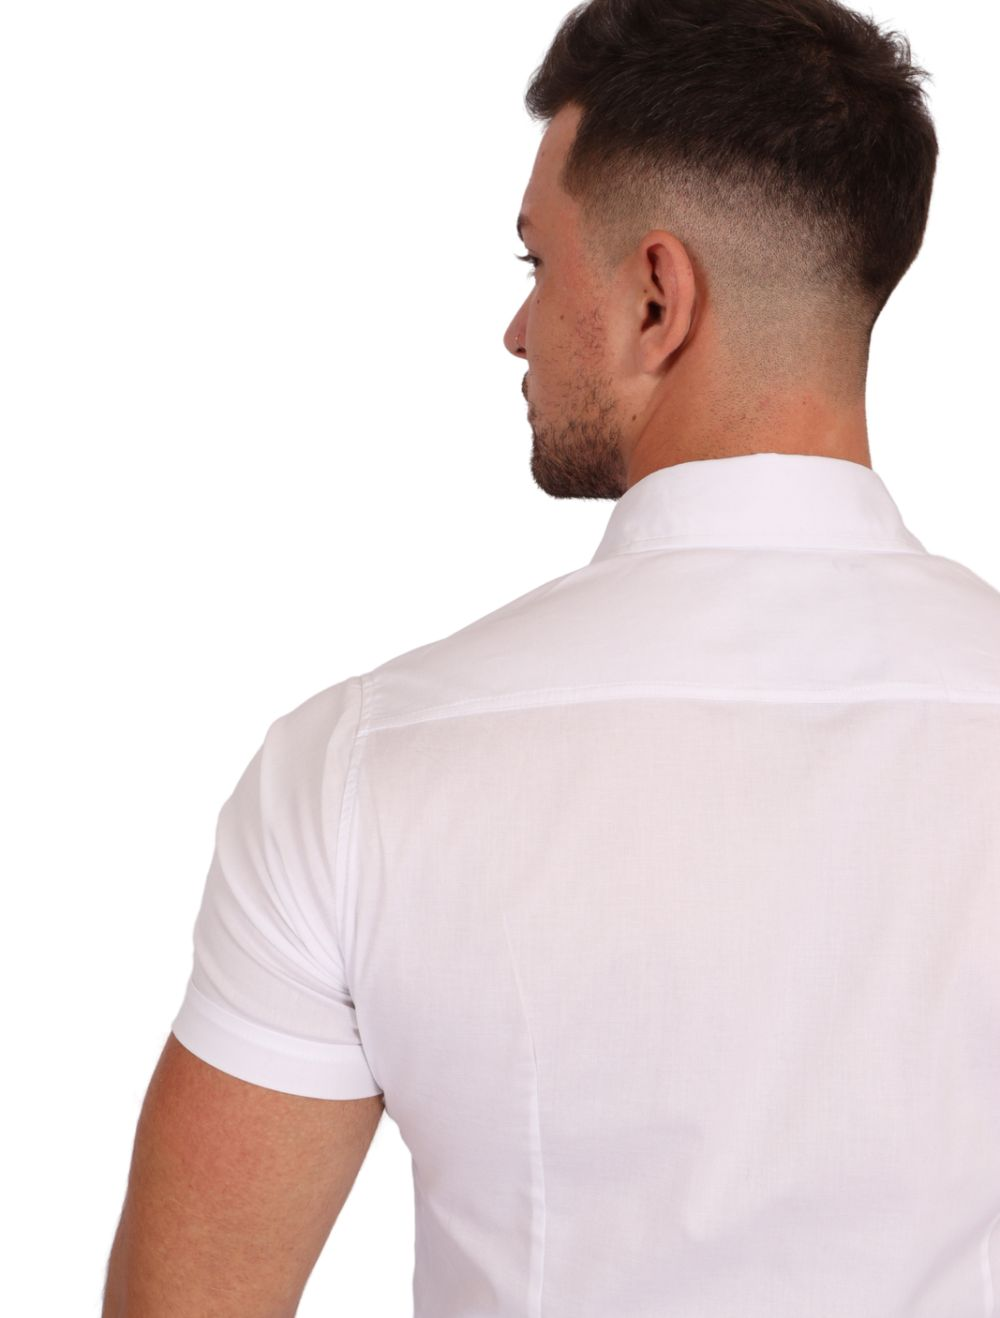 Camisa Masculina Manga Curta Lisa Branco